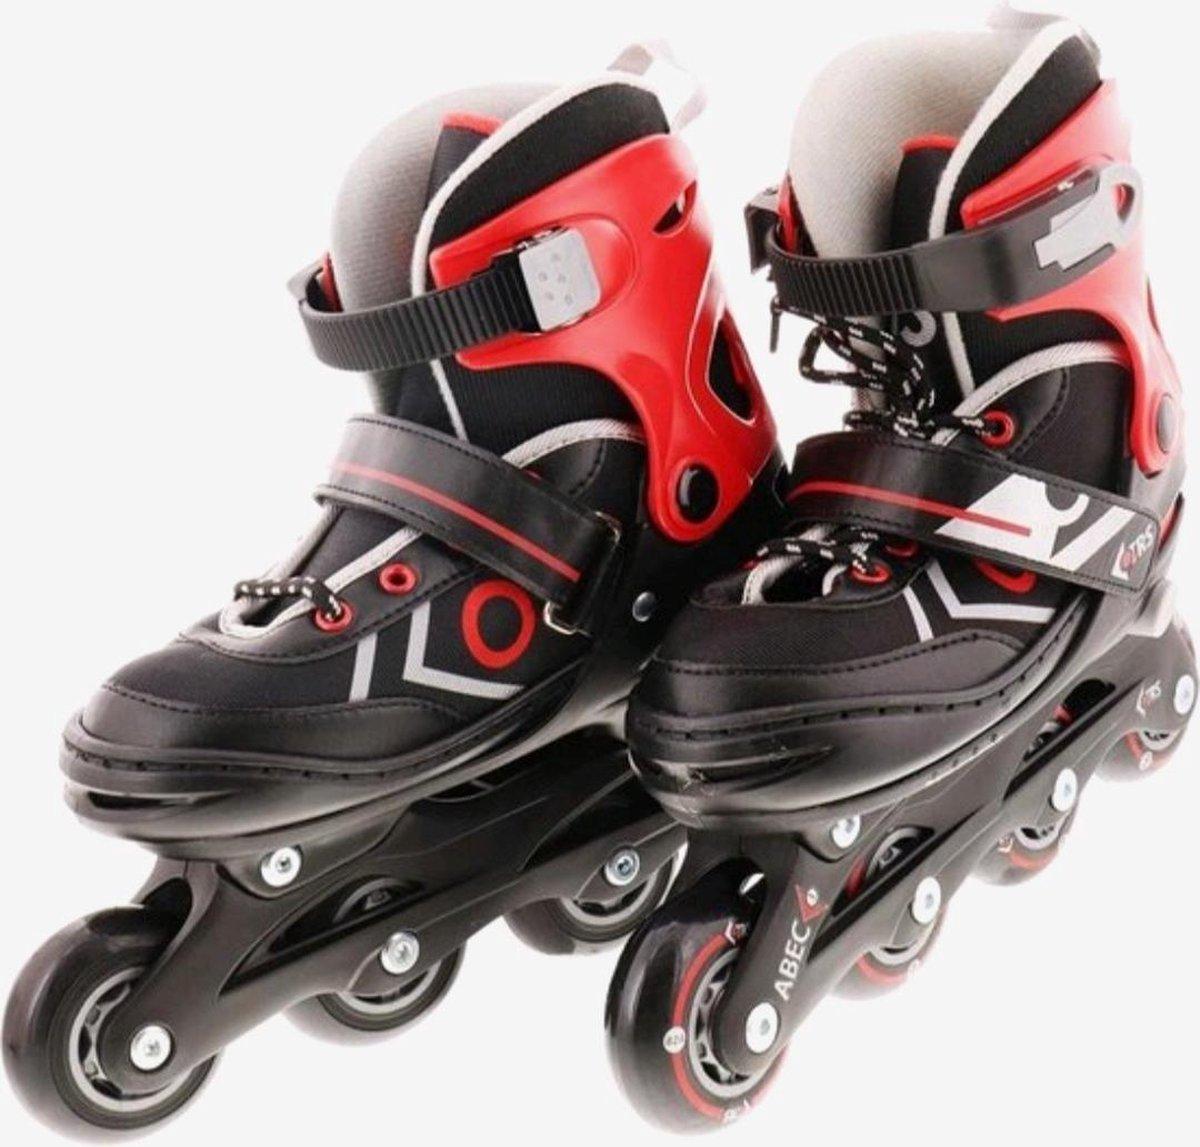 Verstelbare inline skates - ( MAAT 30 - 33 ) Buitensport skates Zwart / Rood